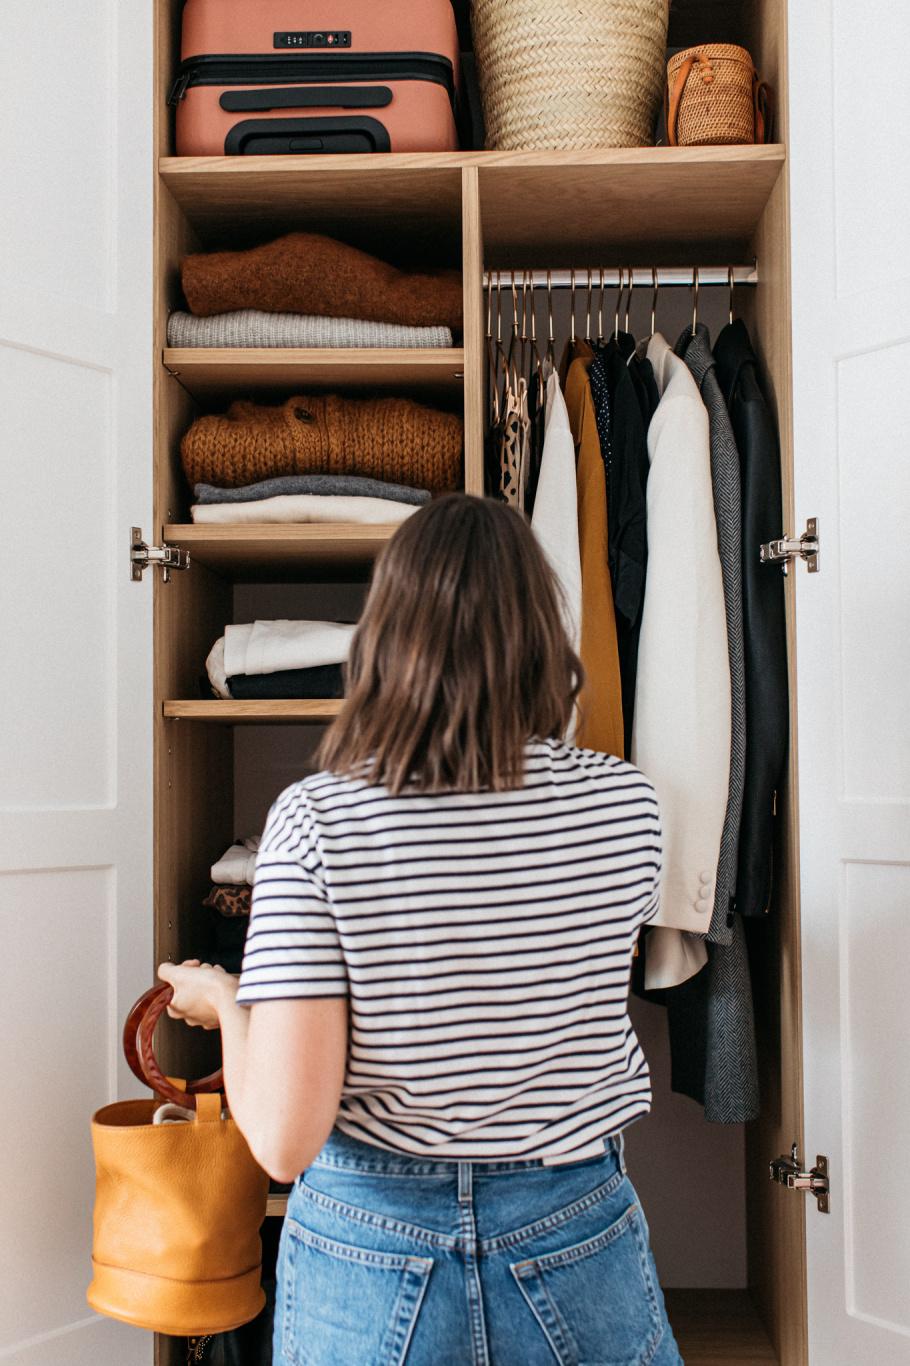 Why I'm Stripping My Capsule Wardrobe Back To Basics – The